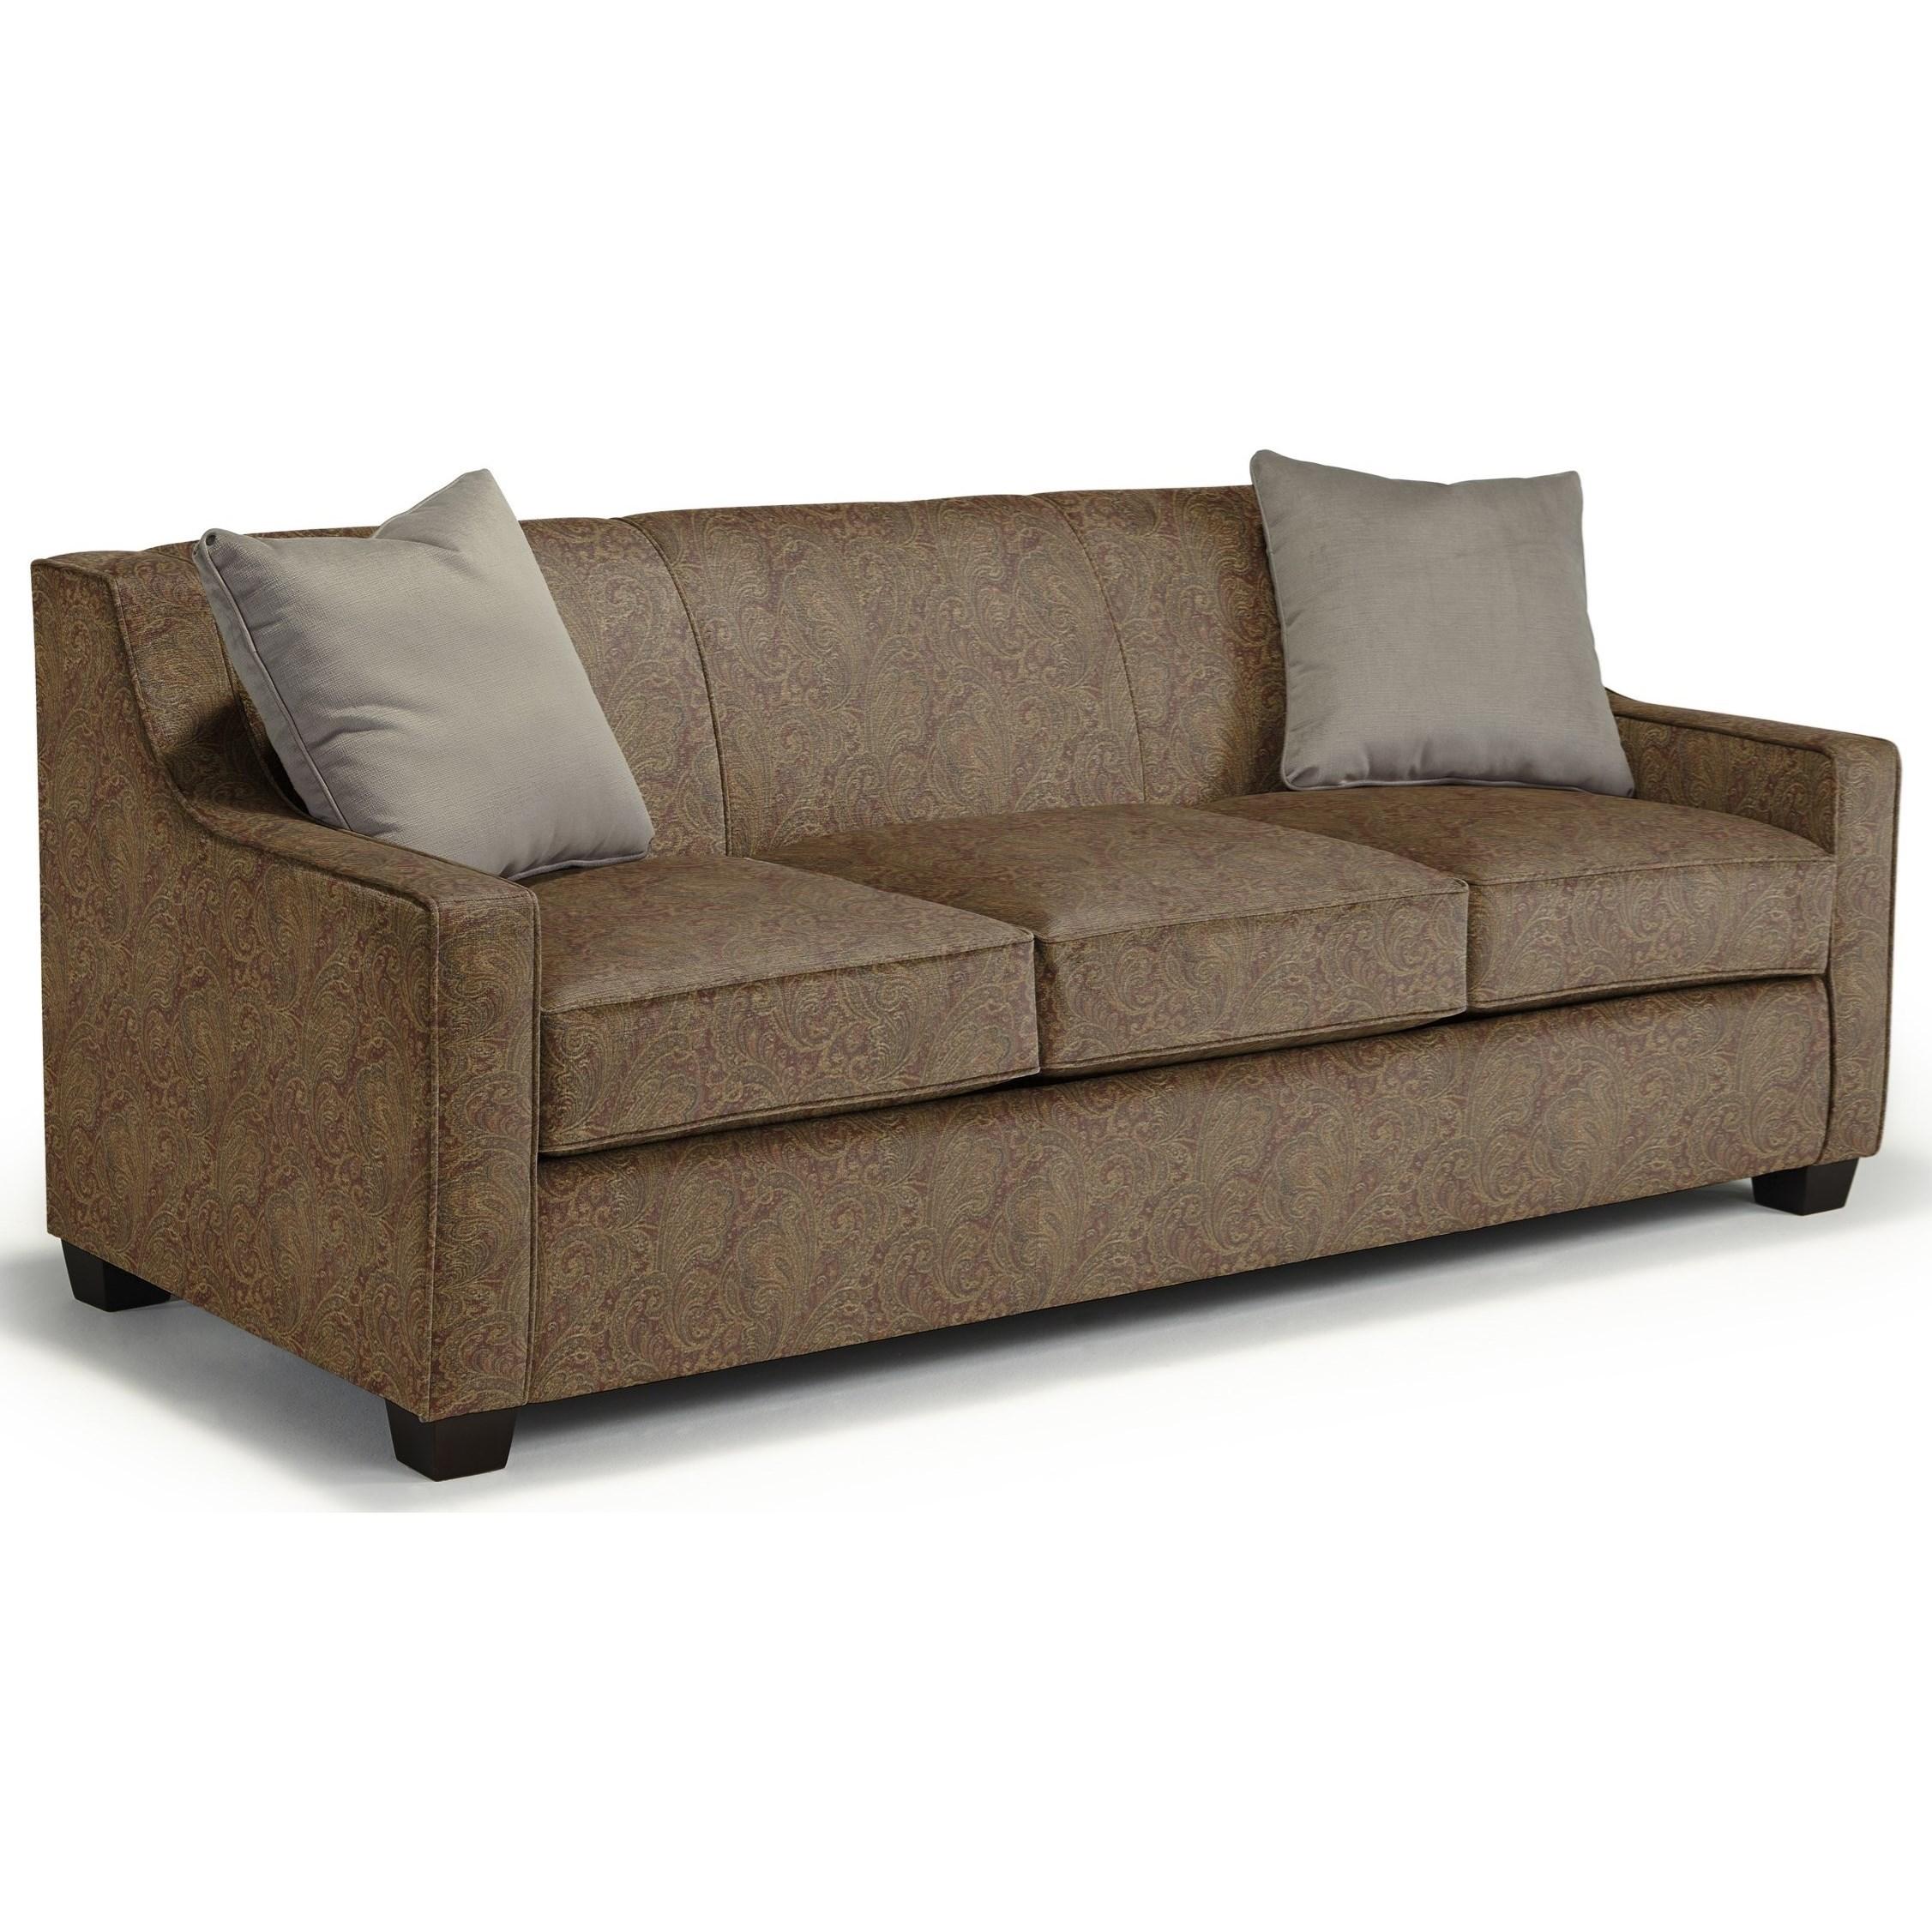 Marinette Queen Sleeper by Best Home Furnishings at Lucas Furniture & Mattress